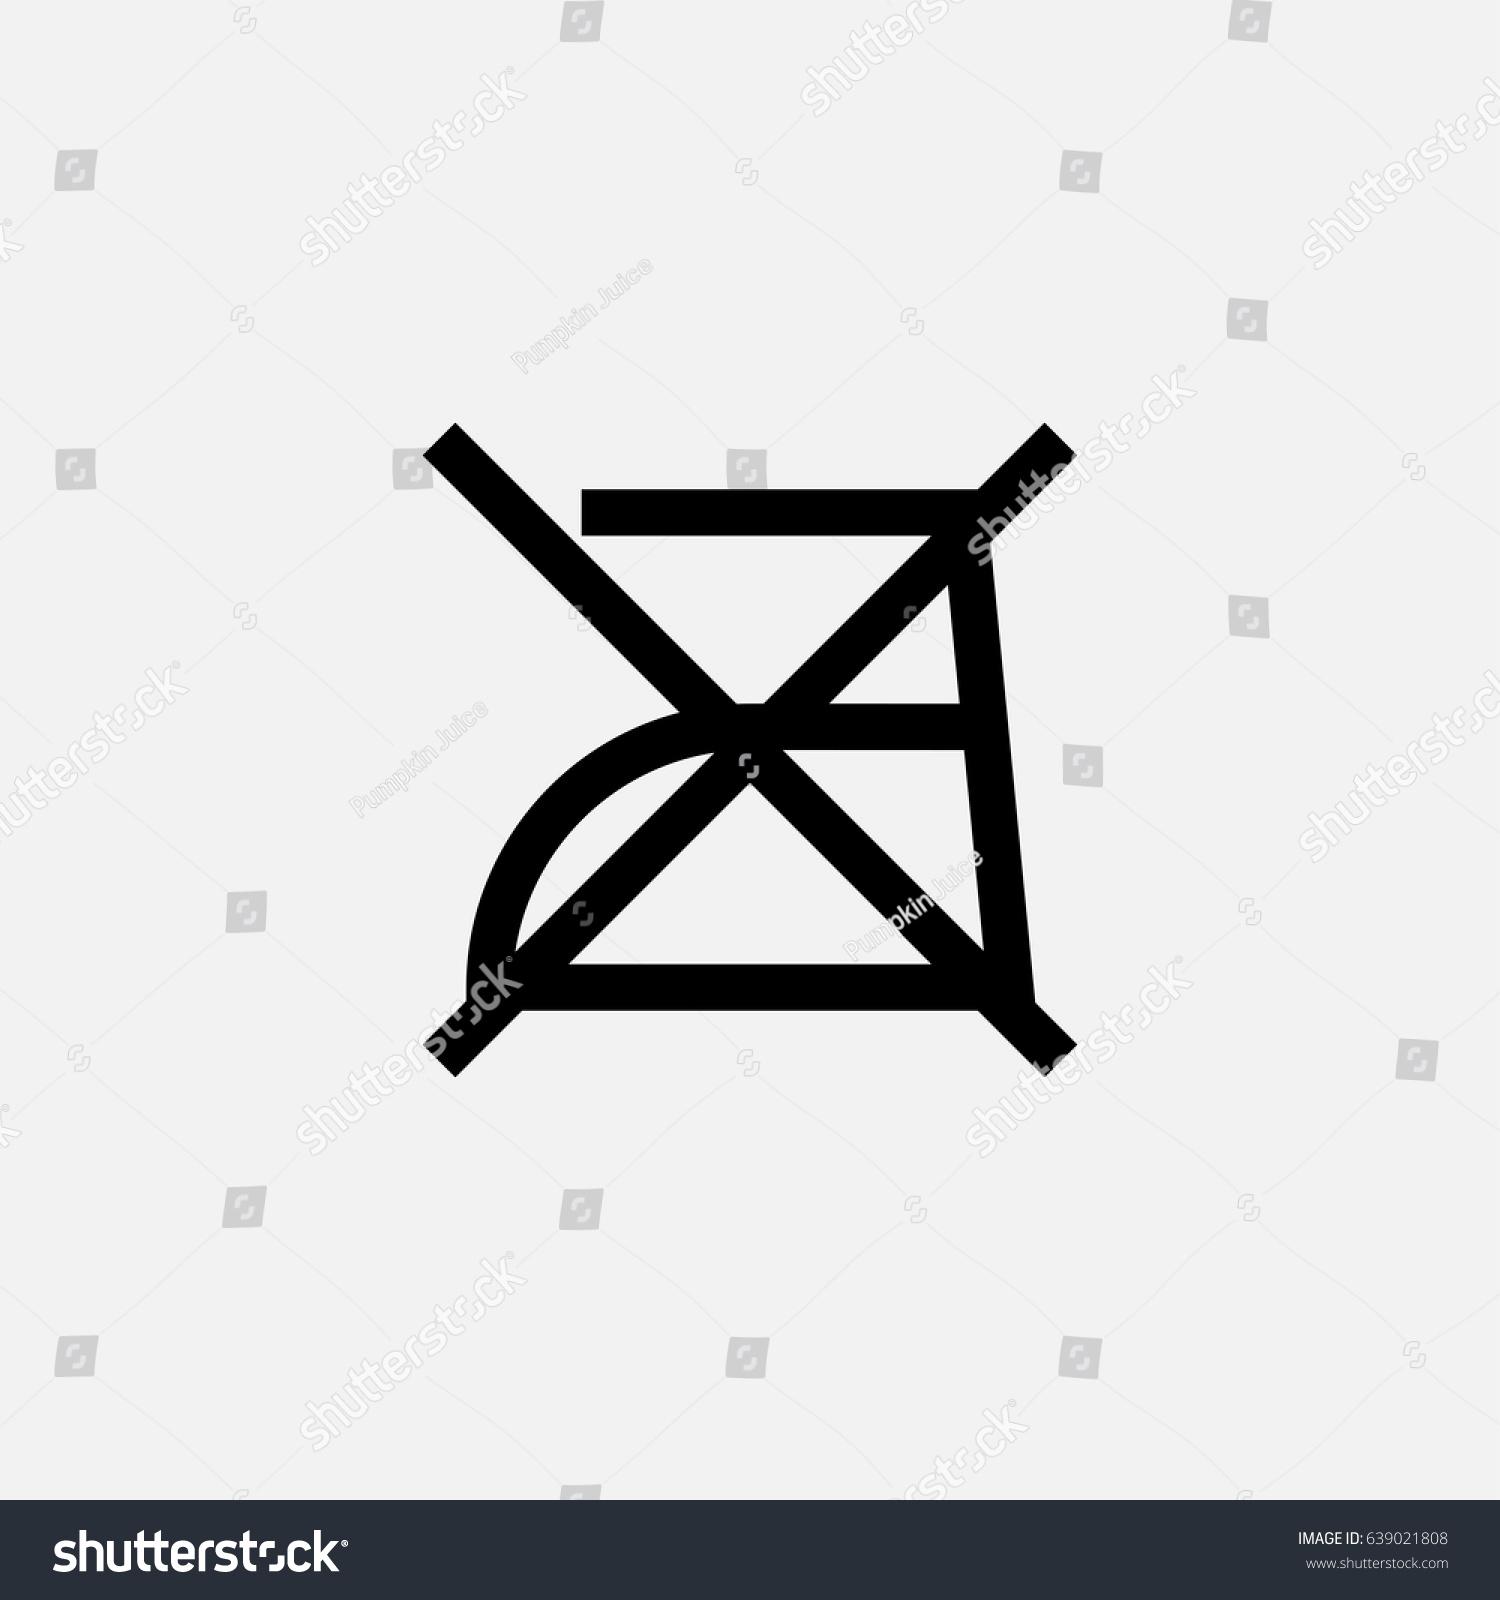 Do Not Iron Outline Vector Icon Stock Vector 639021808 Shutterstock